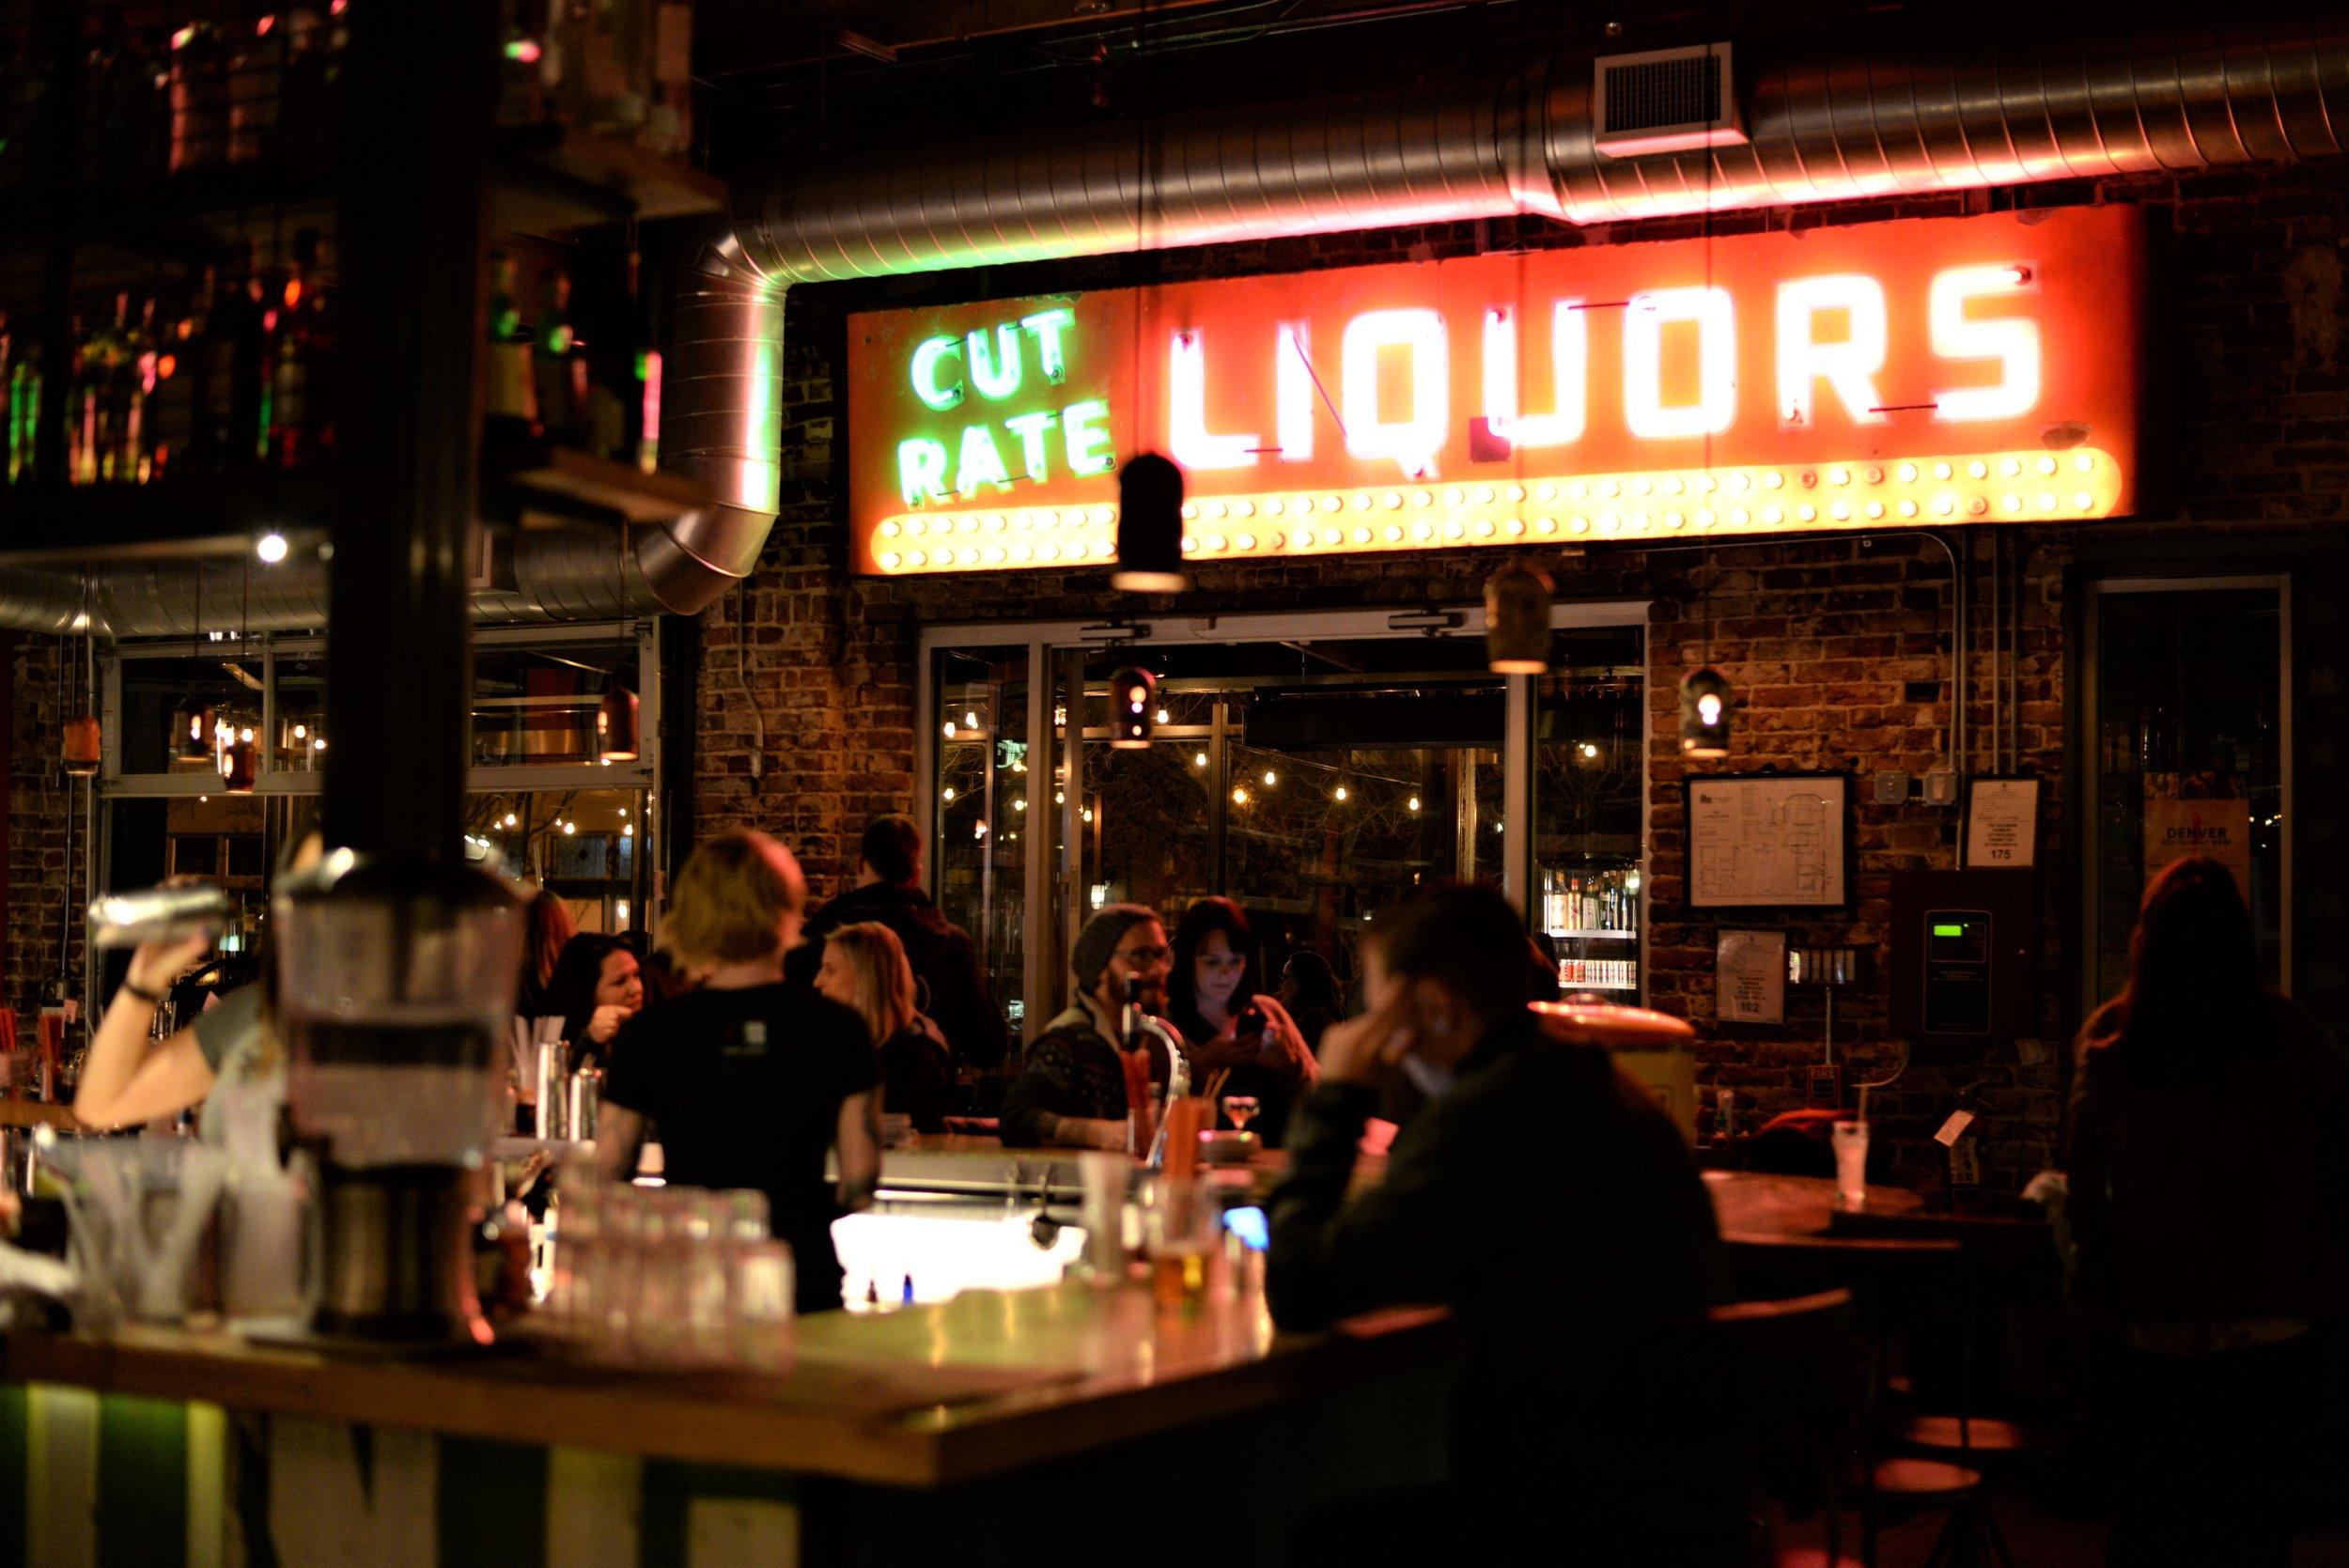 Bar Photo by Josh Stephens